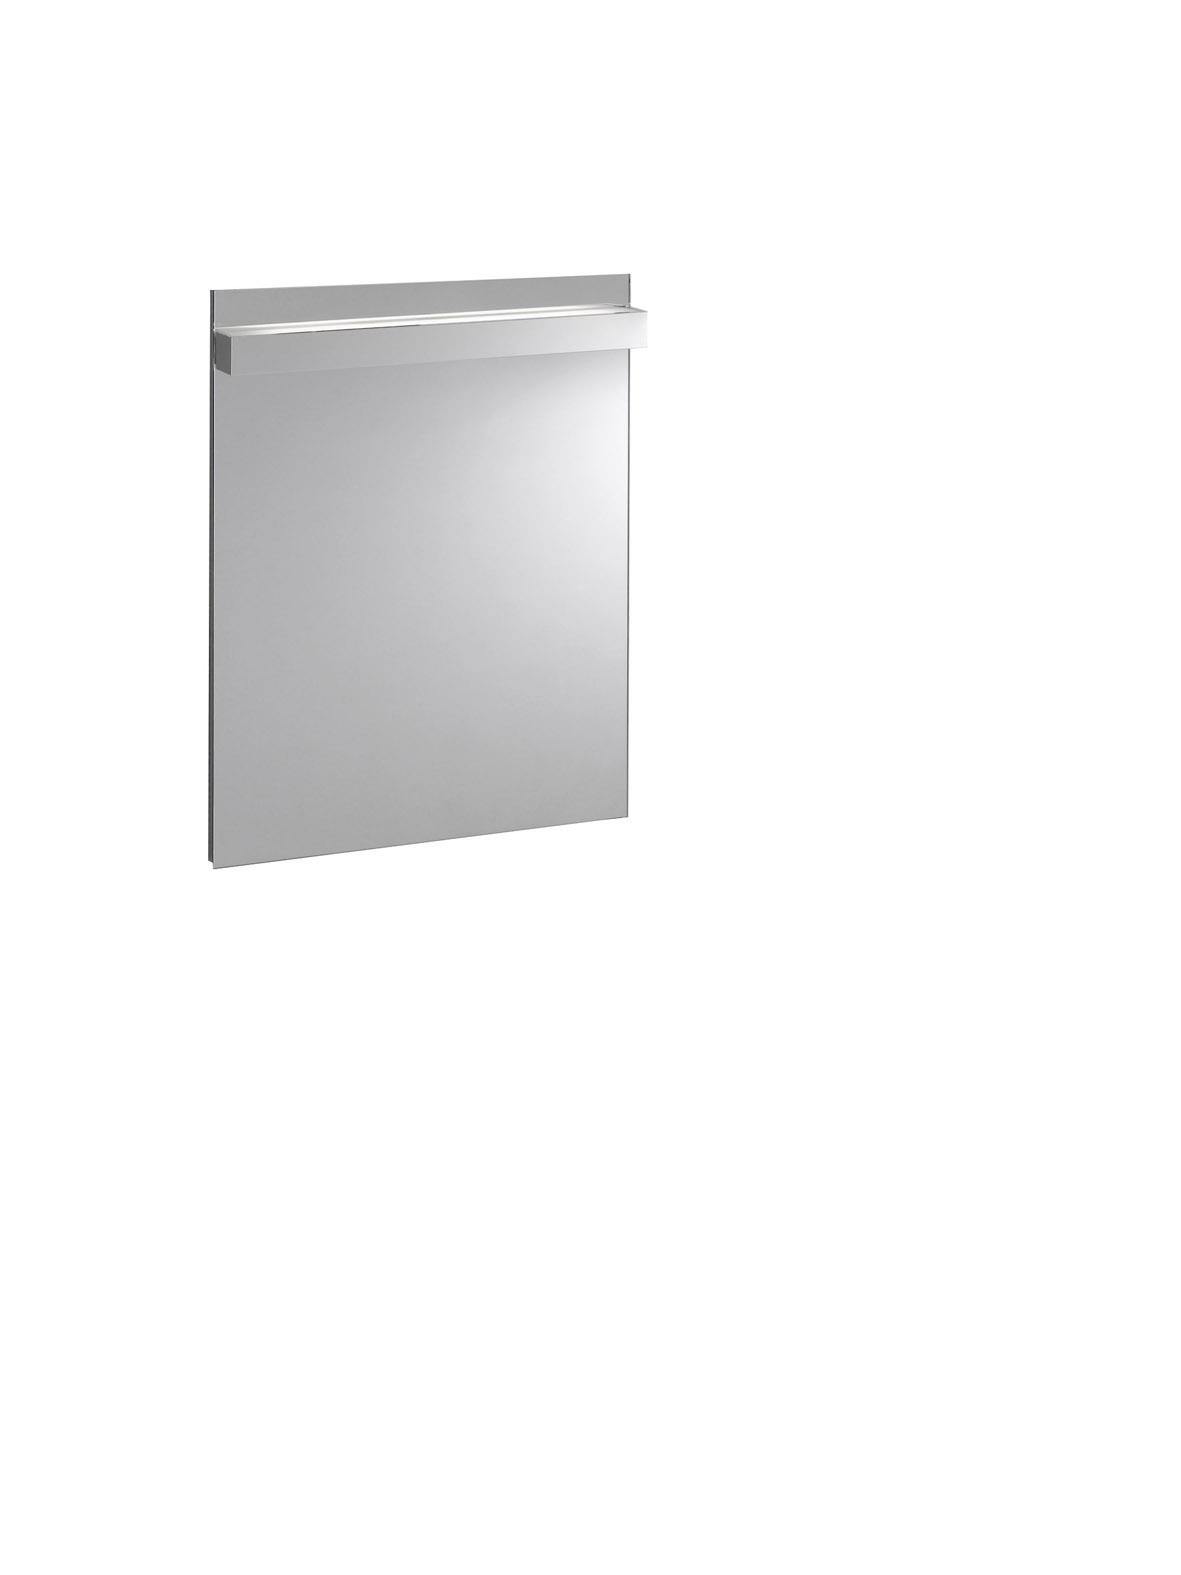 zrcadlo KERAMAG Icon zrcadlo s osvětlením 60x75 cm